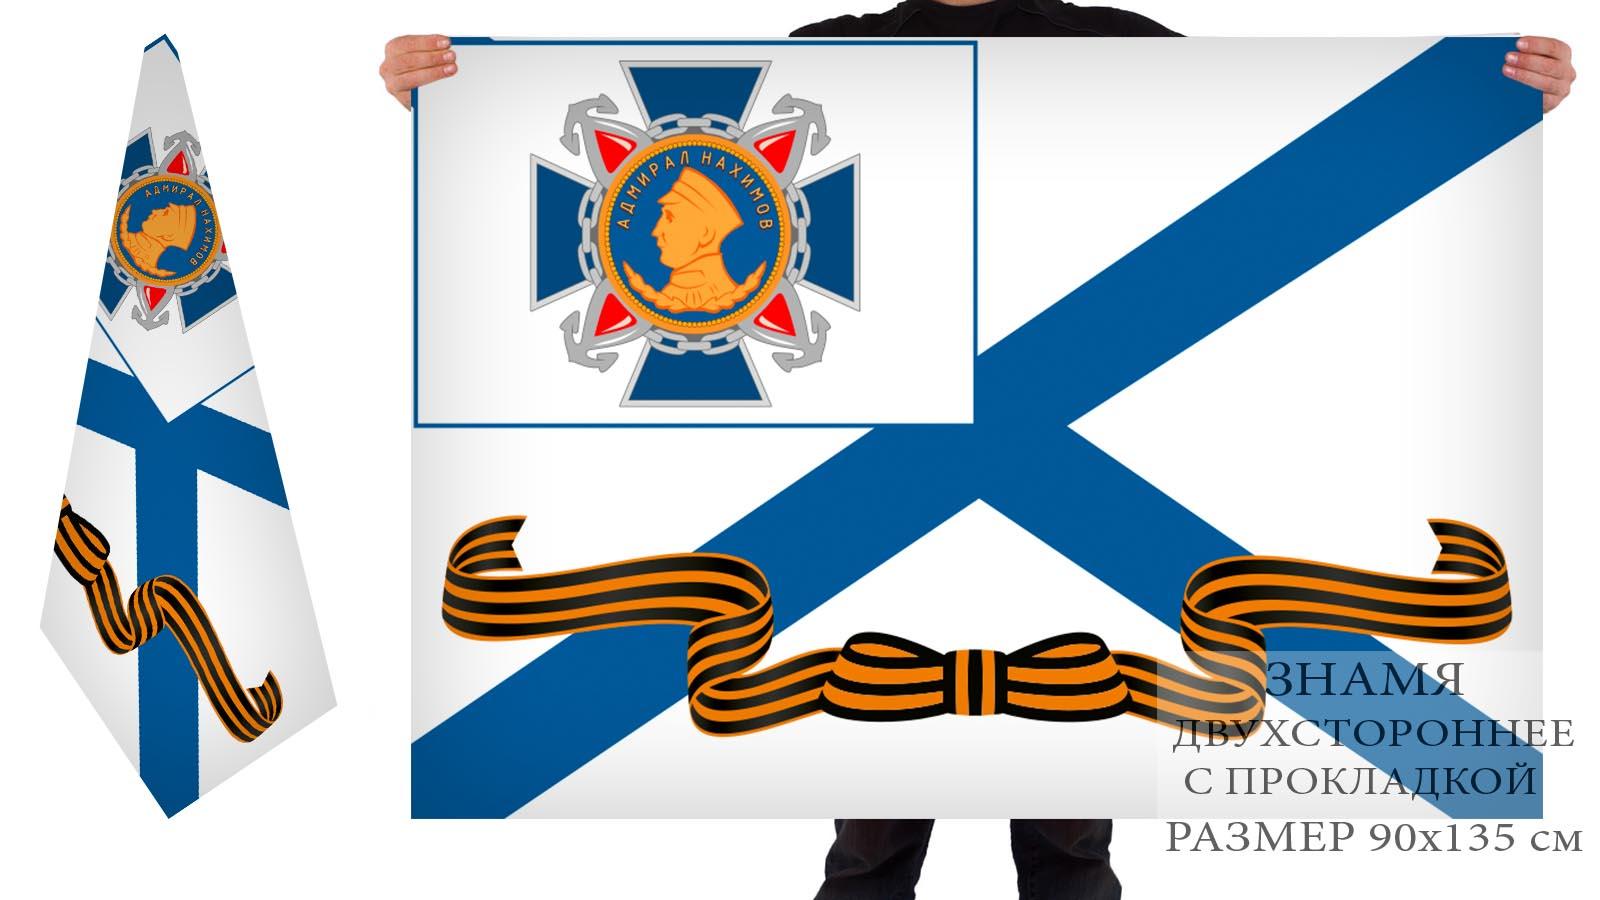 Двусторонний Гвардейский Андреевский флаг с Орденом адмирала Нахимова